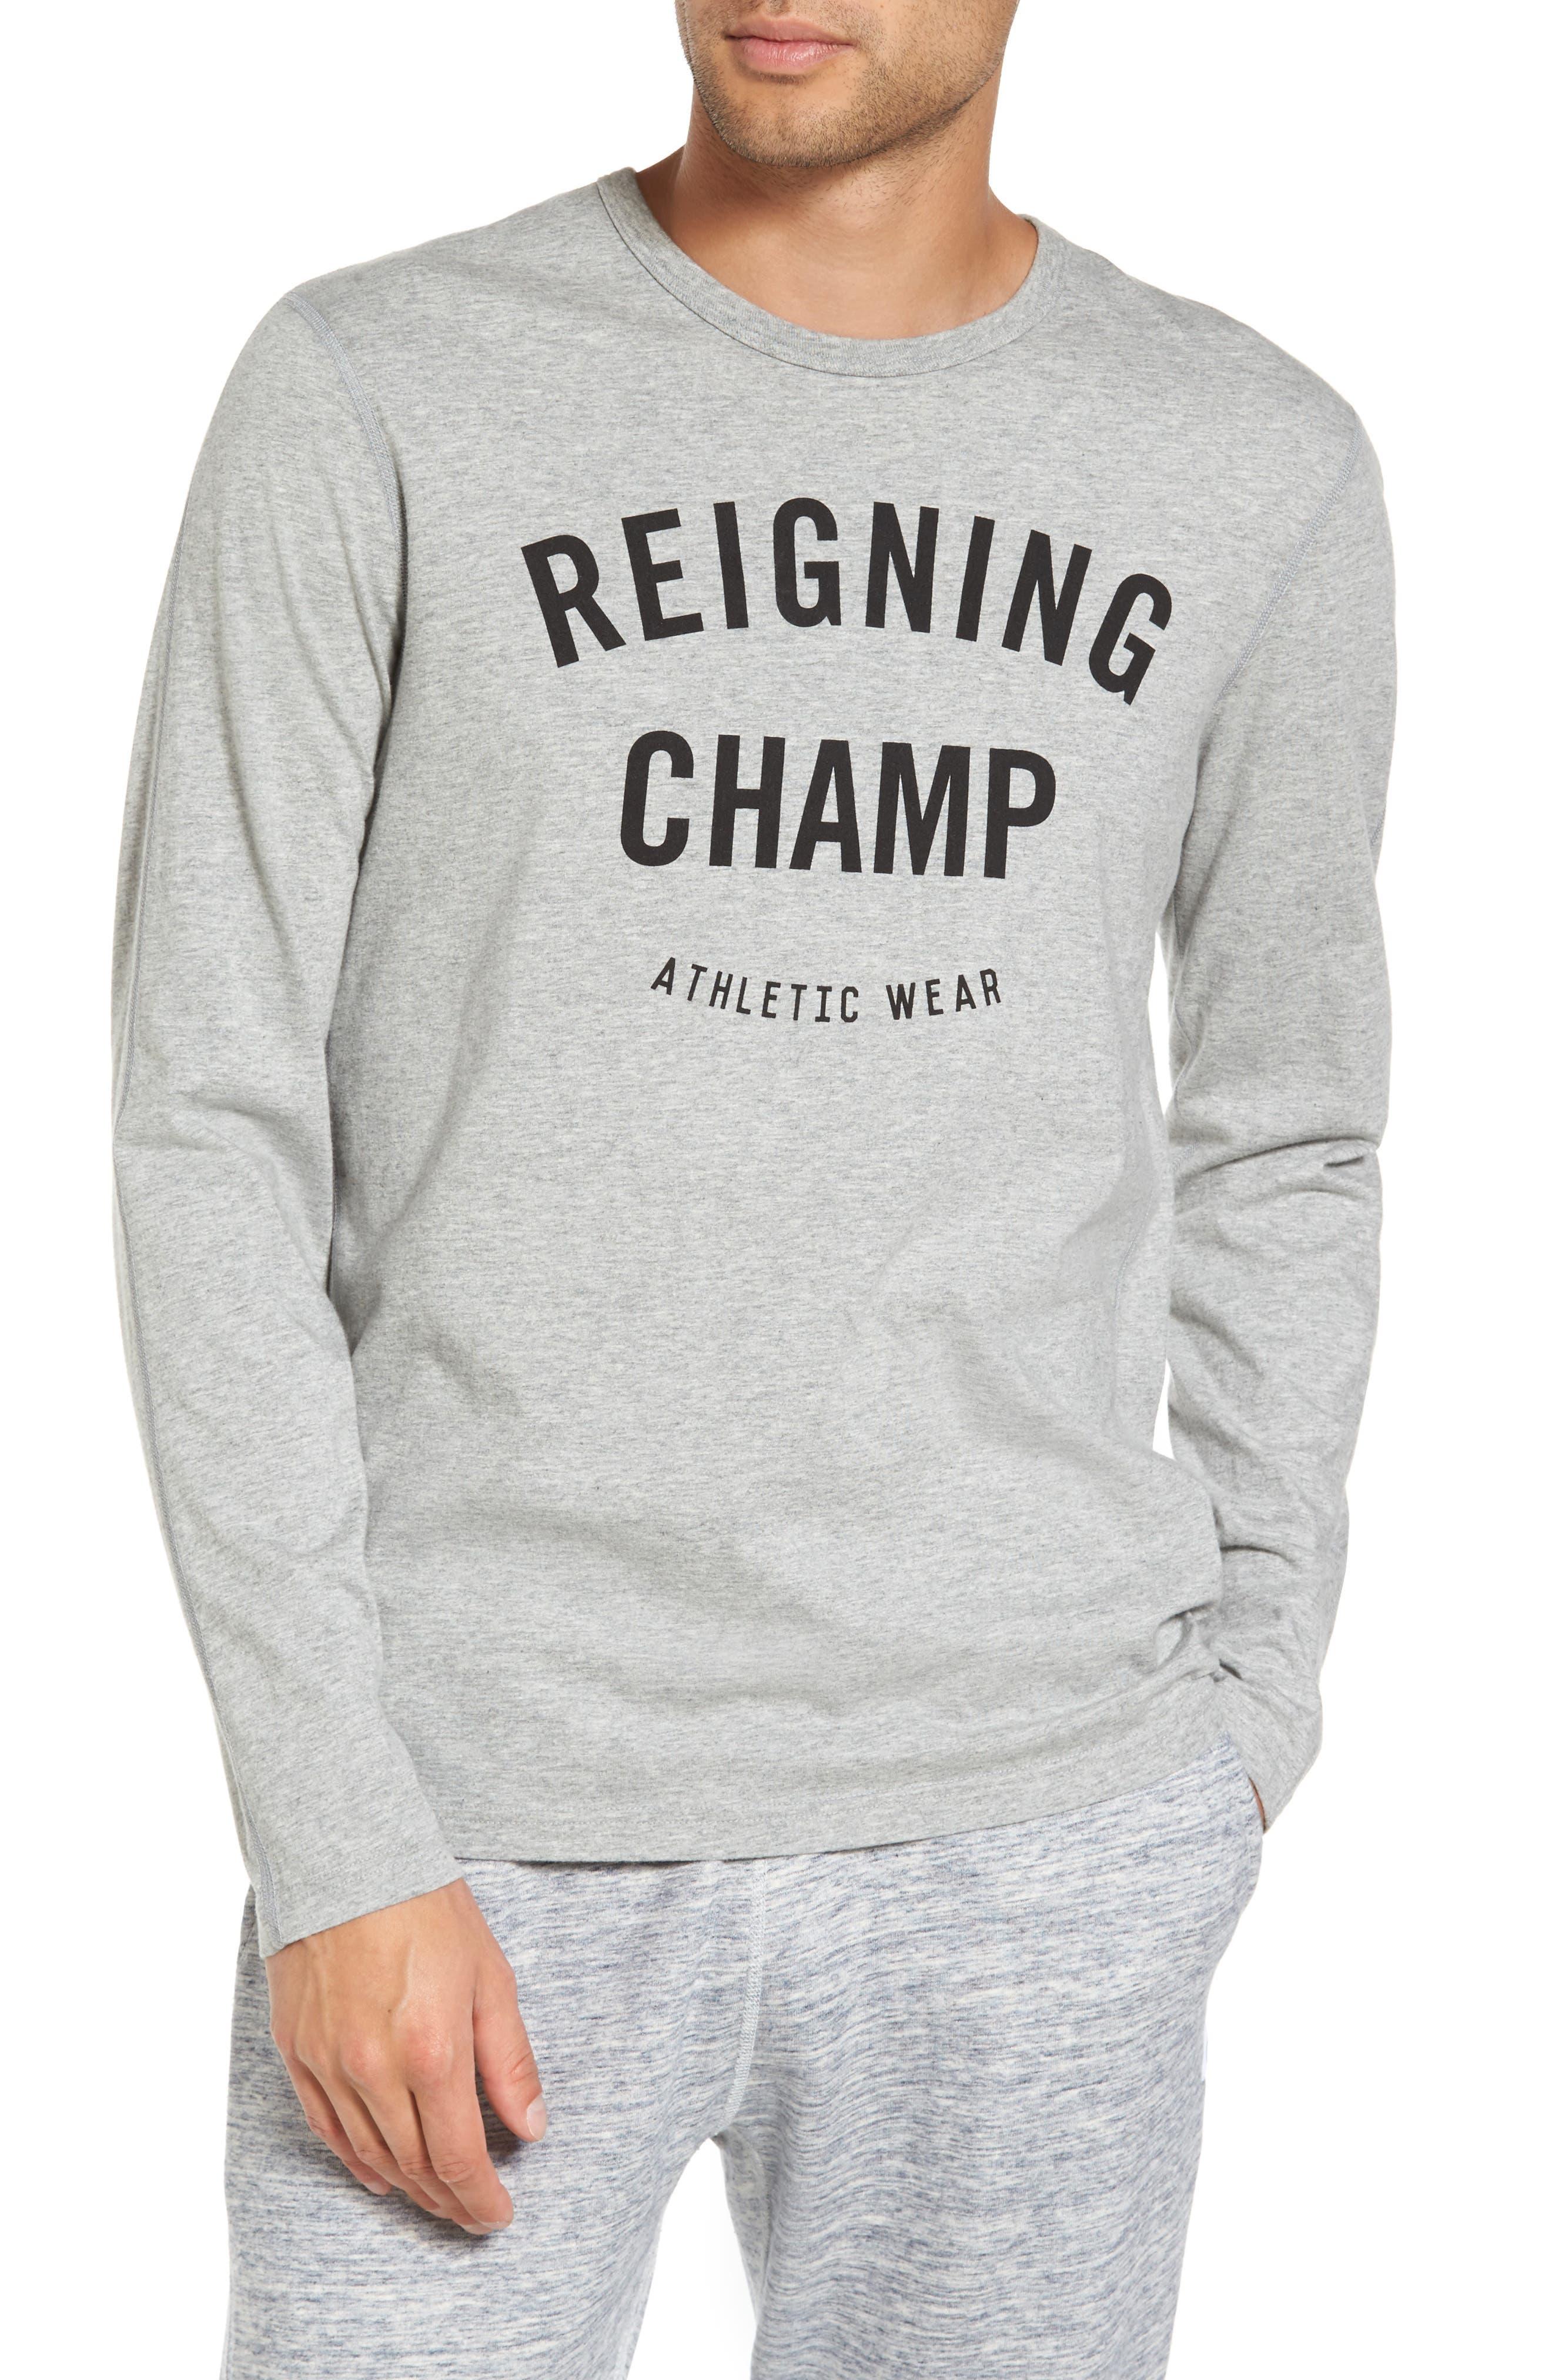 Main Image - Reigning Champ Gym Logo Long Sleeve T-Shirt